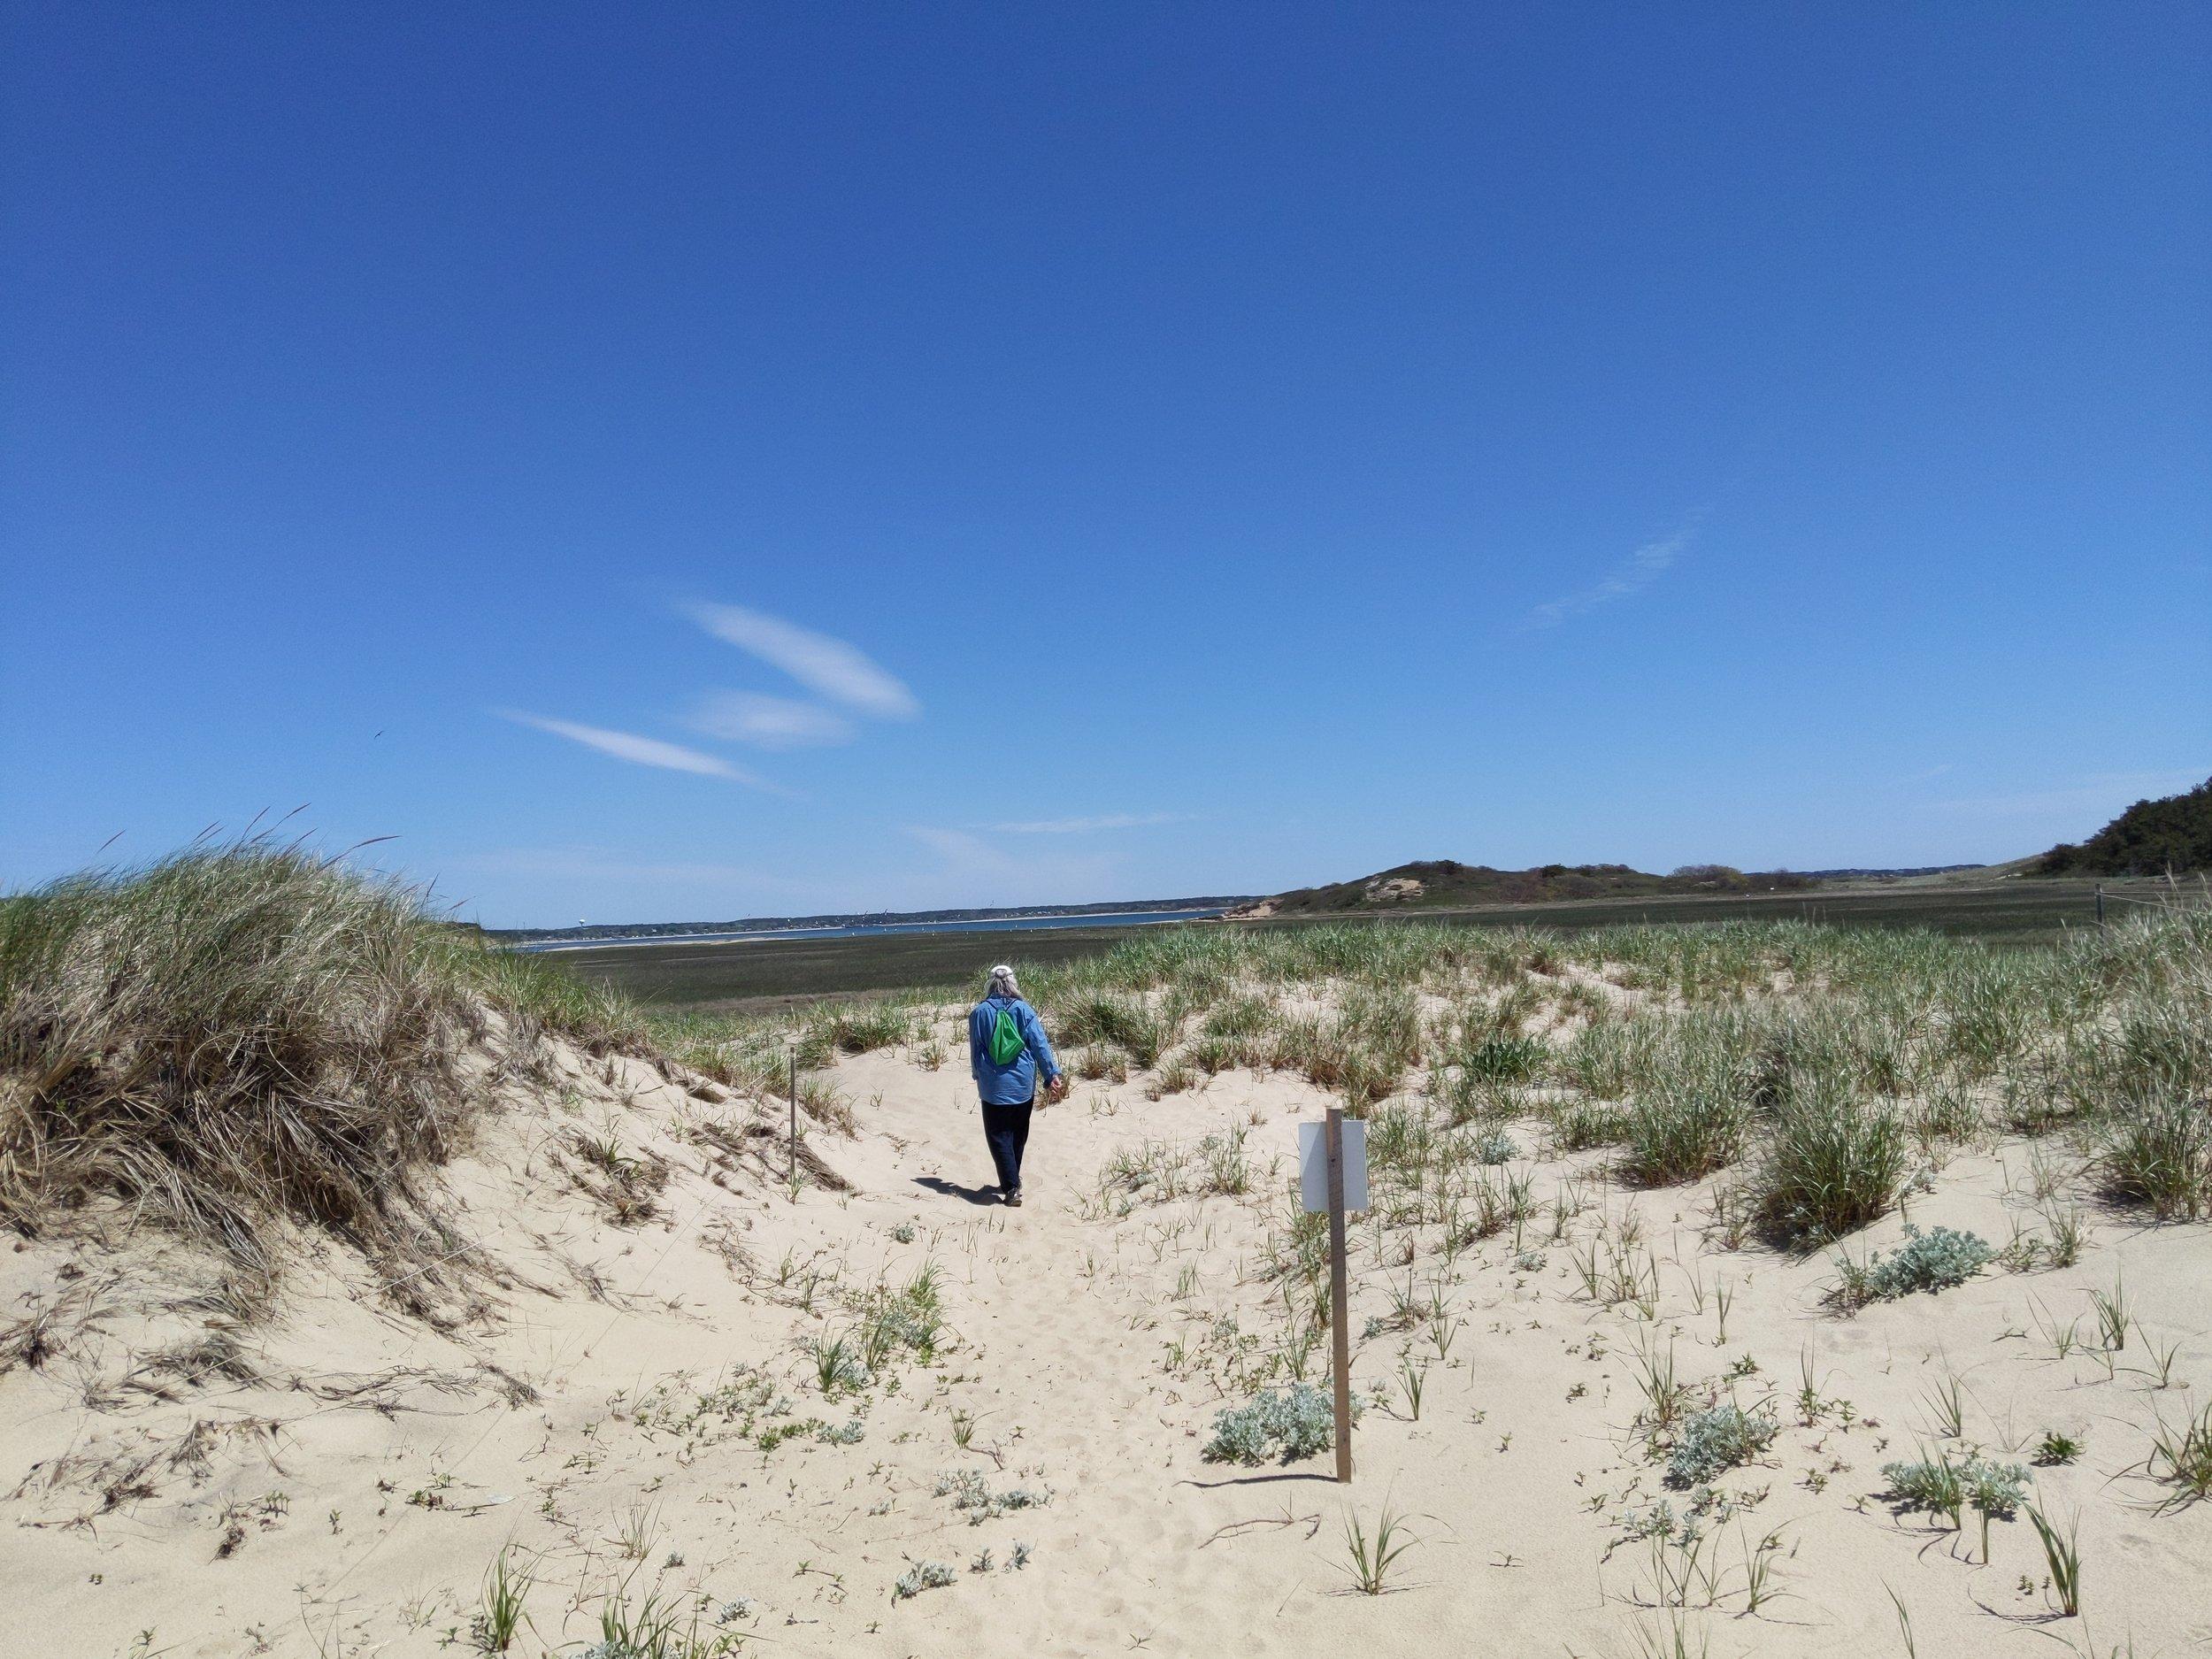 Sue, during our walk on a wonderful trail in Wellfleet, MA, Cape Cod